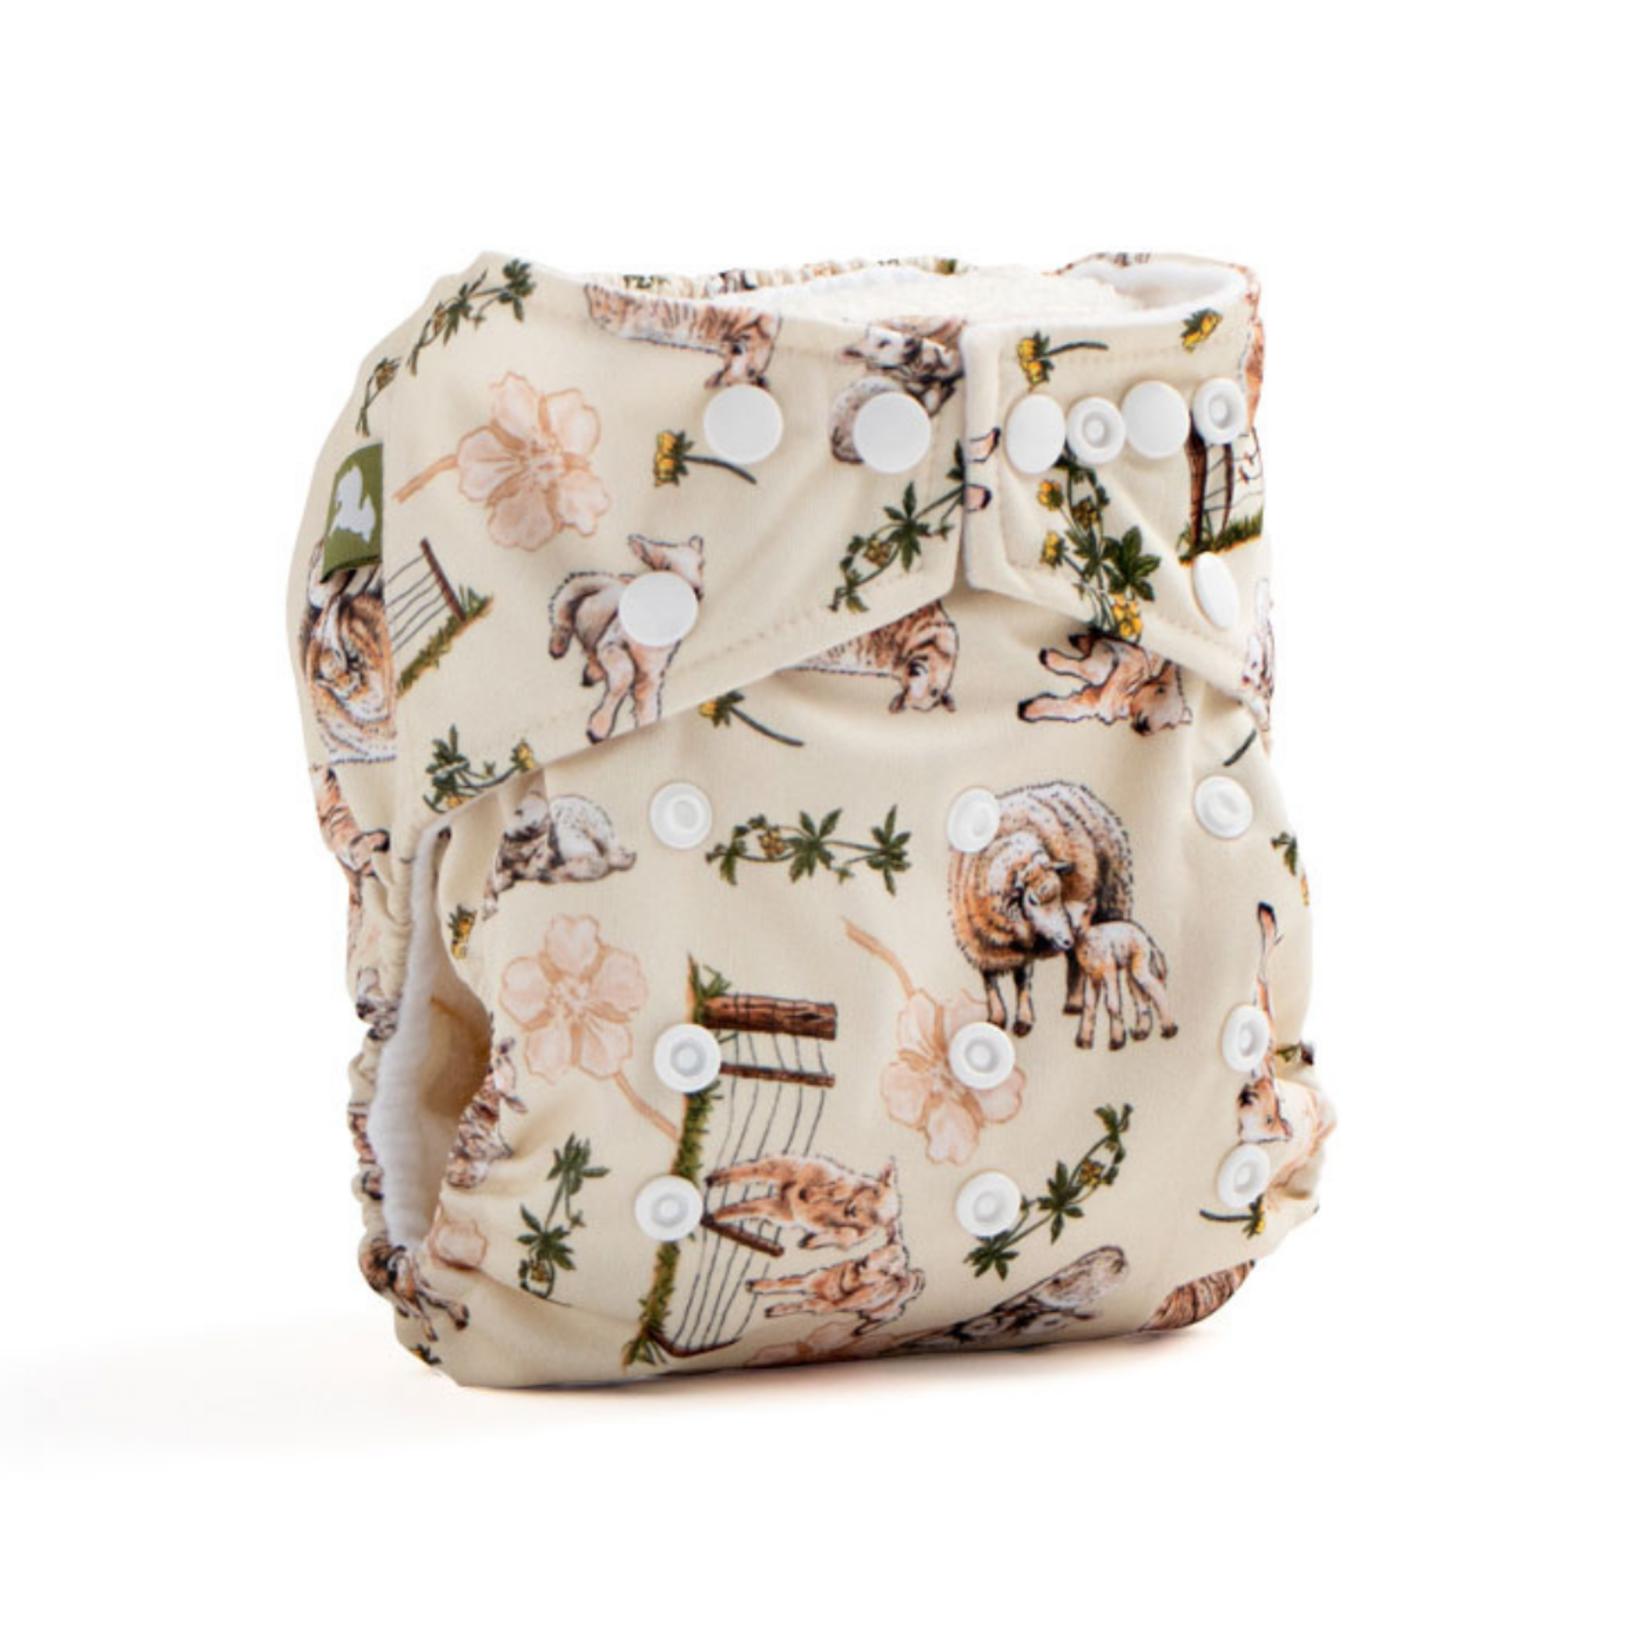 LittleLamb One Size Pocketluier (Loving ewe)